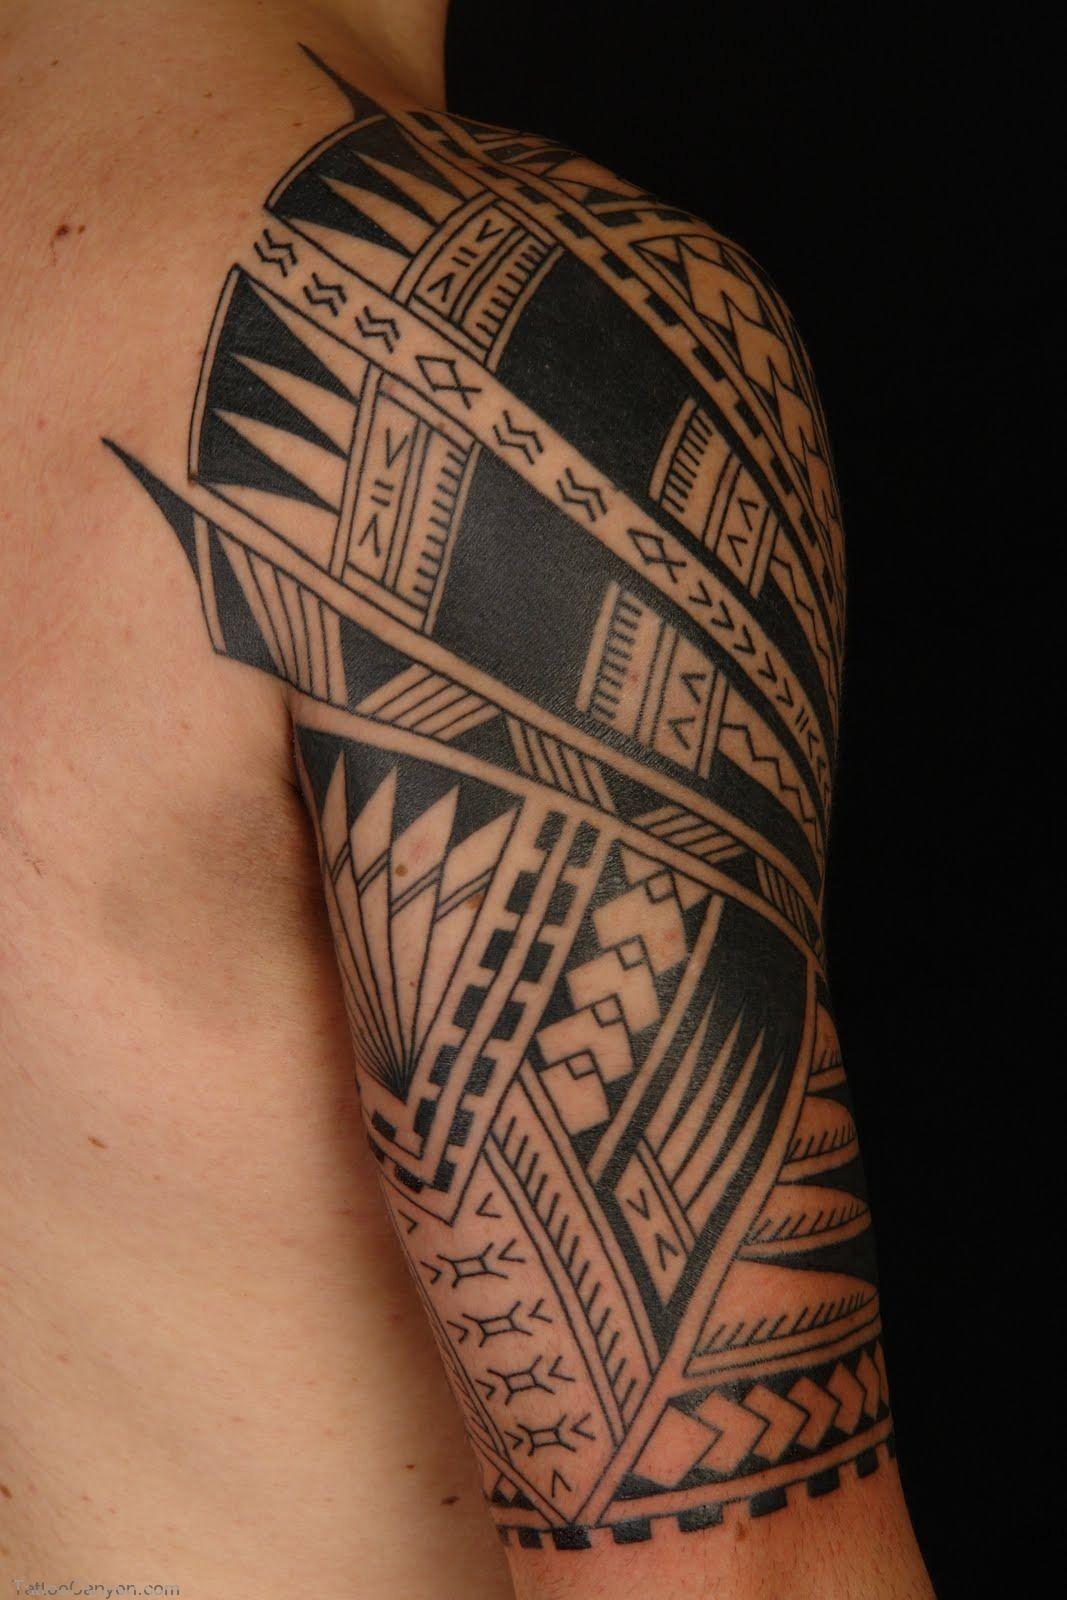 2232 Tattoo Samoan Polynesian Half Sleeve Free Download Tattoo Design Maori Tattoo Samoan Tattoo Tribal Sleeve Tattoos